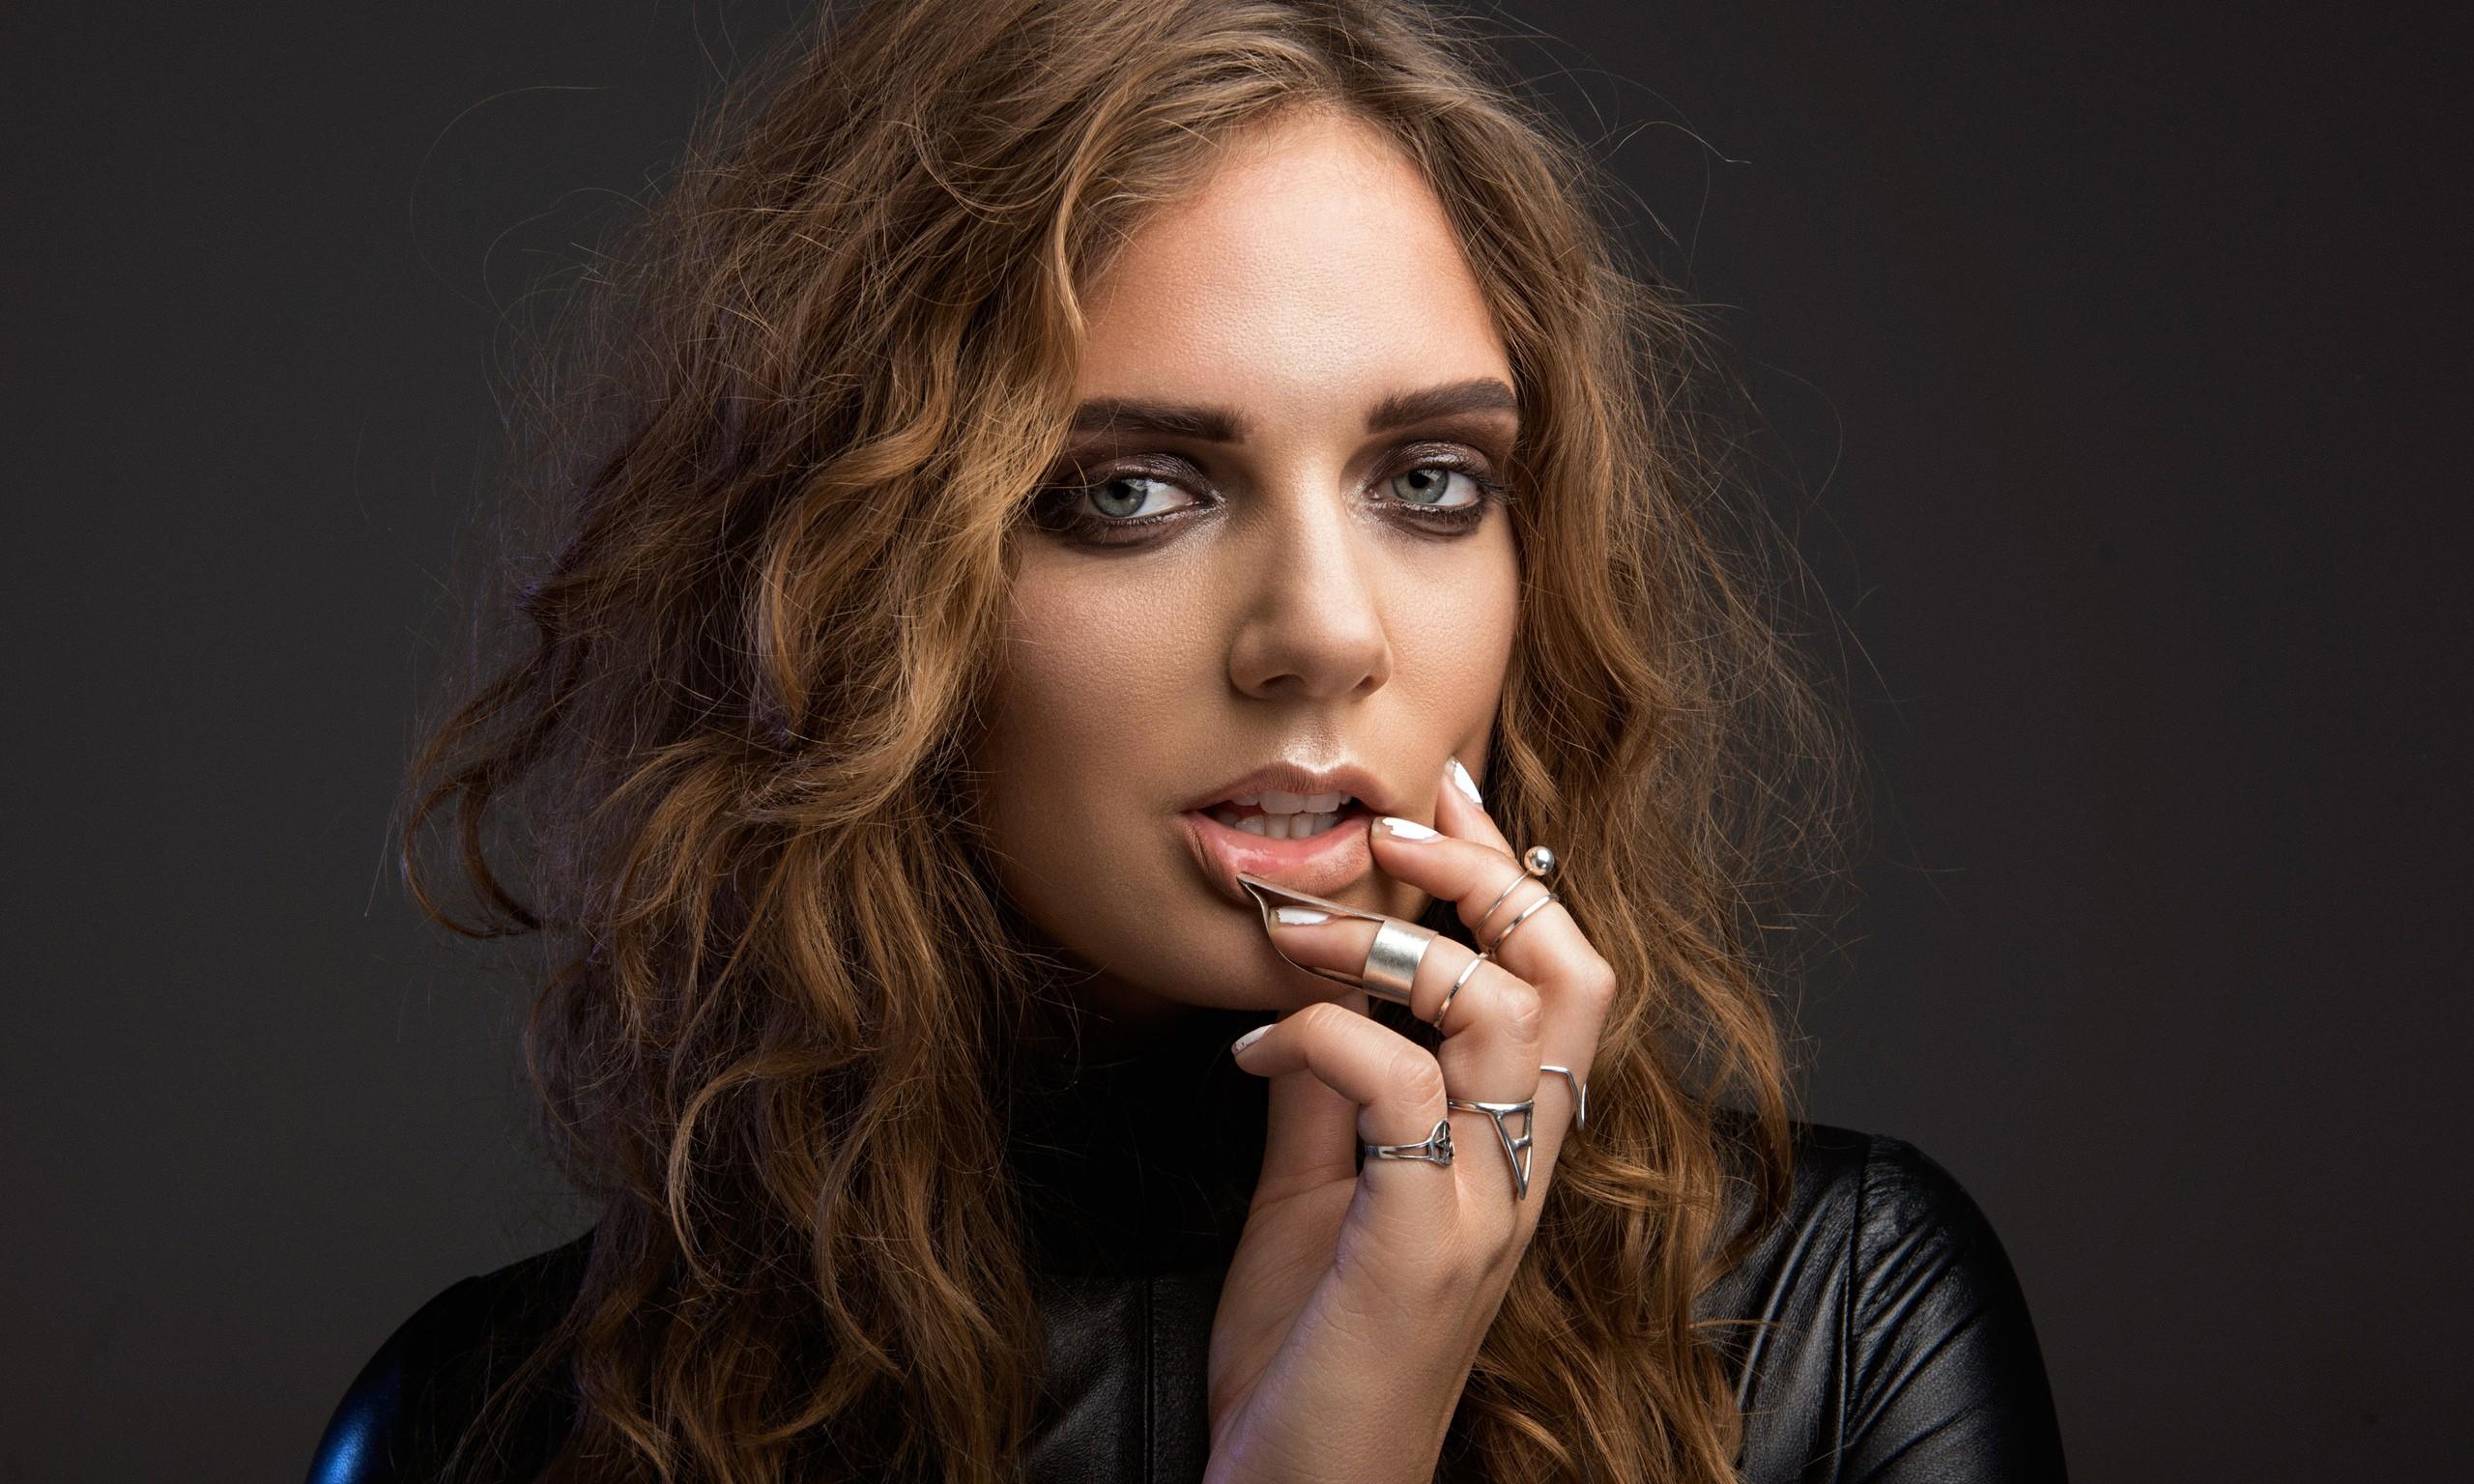 Hintergrundbilder Gesicht Frau Modell Porträt Brünette